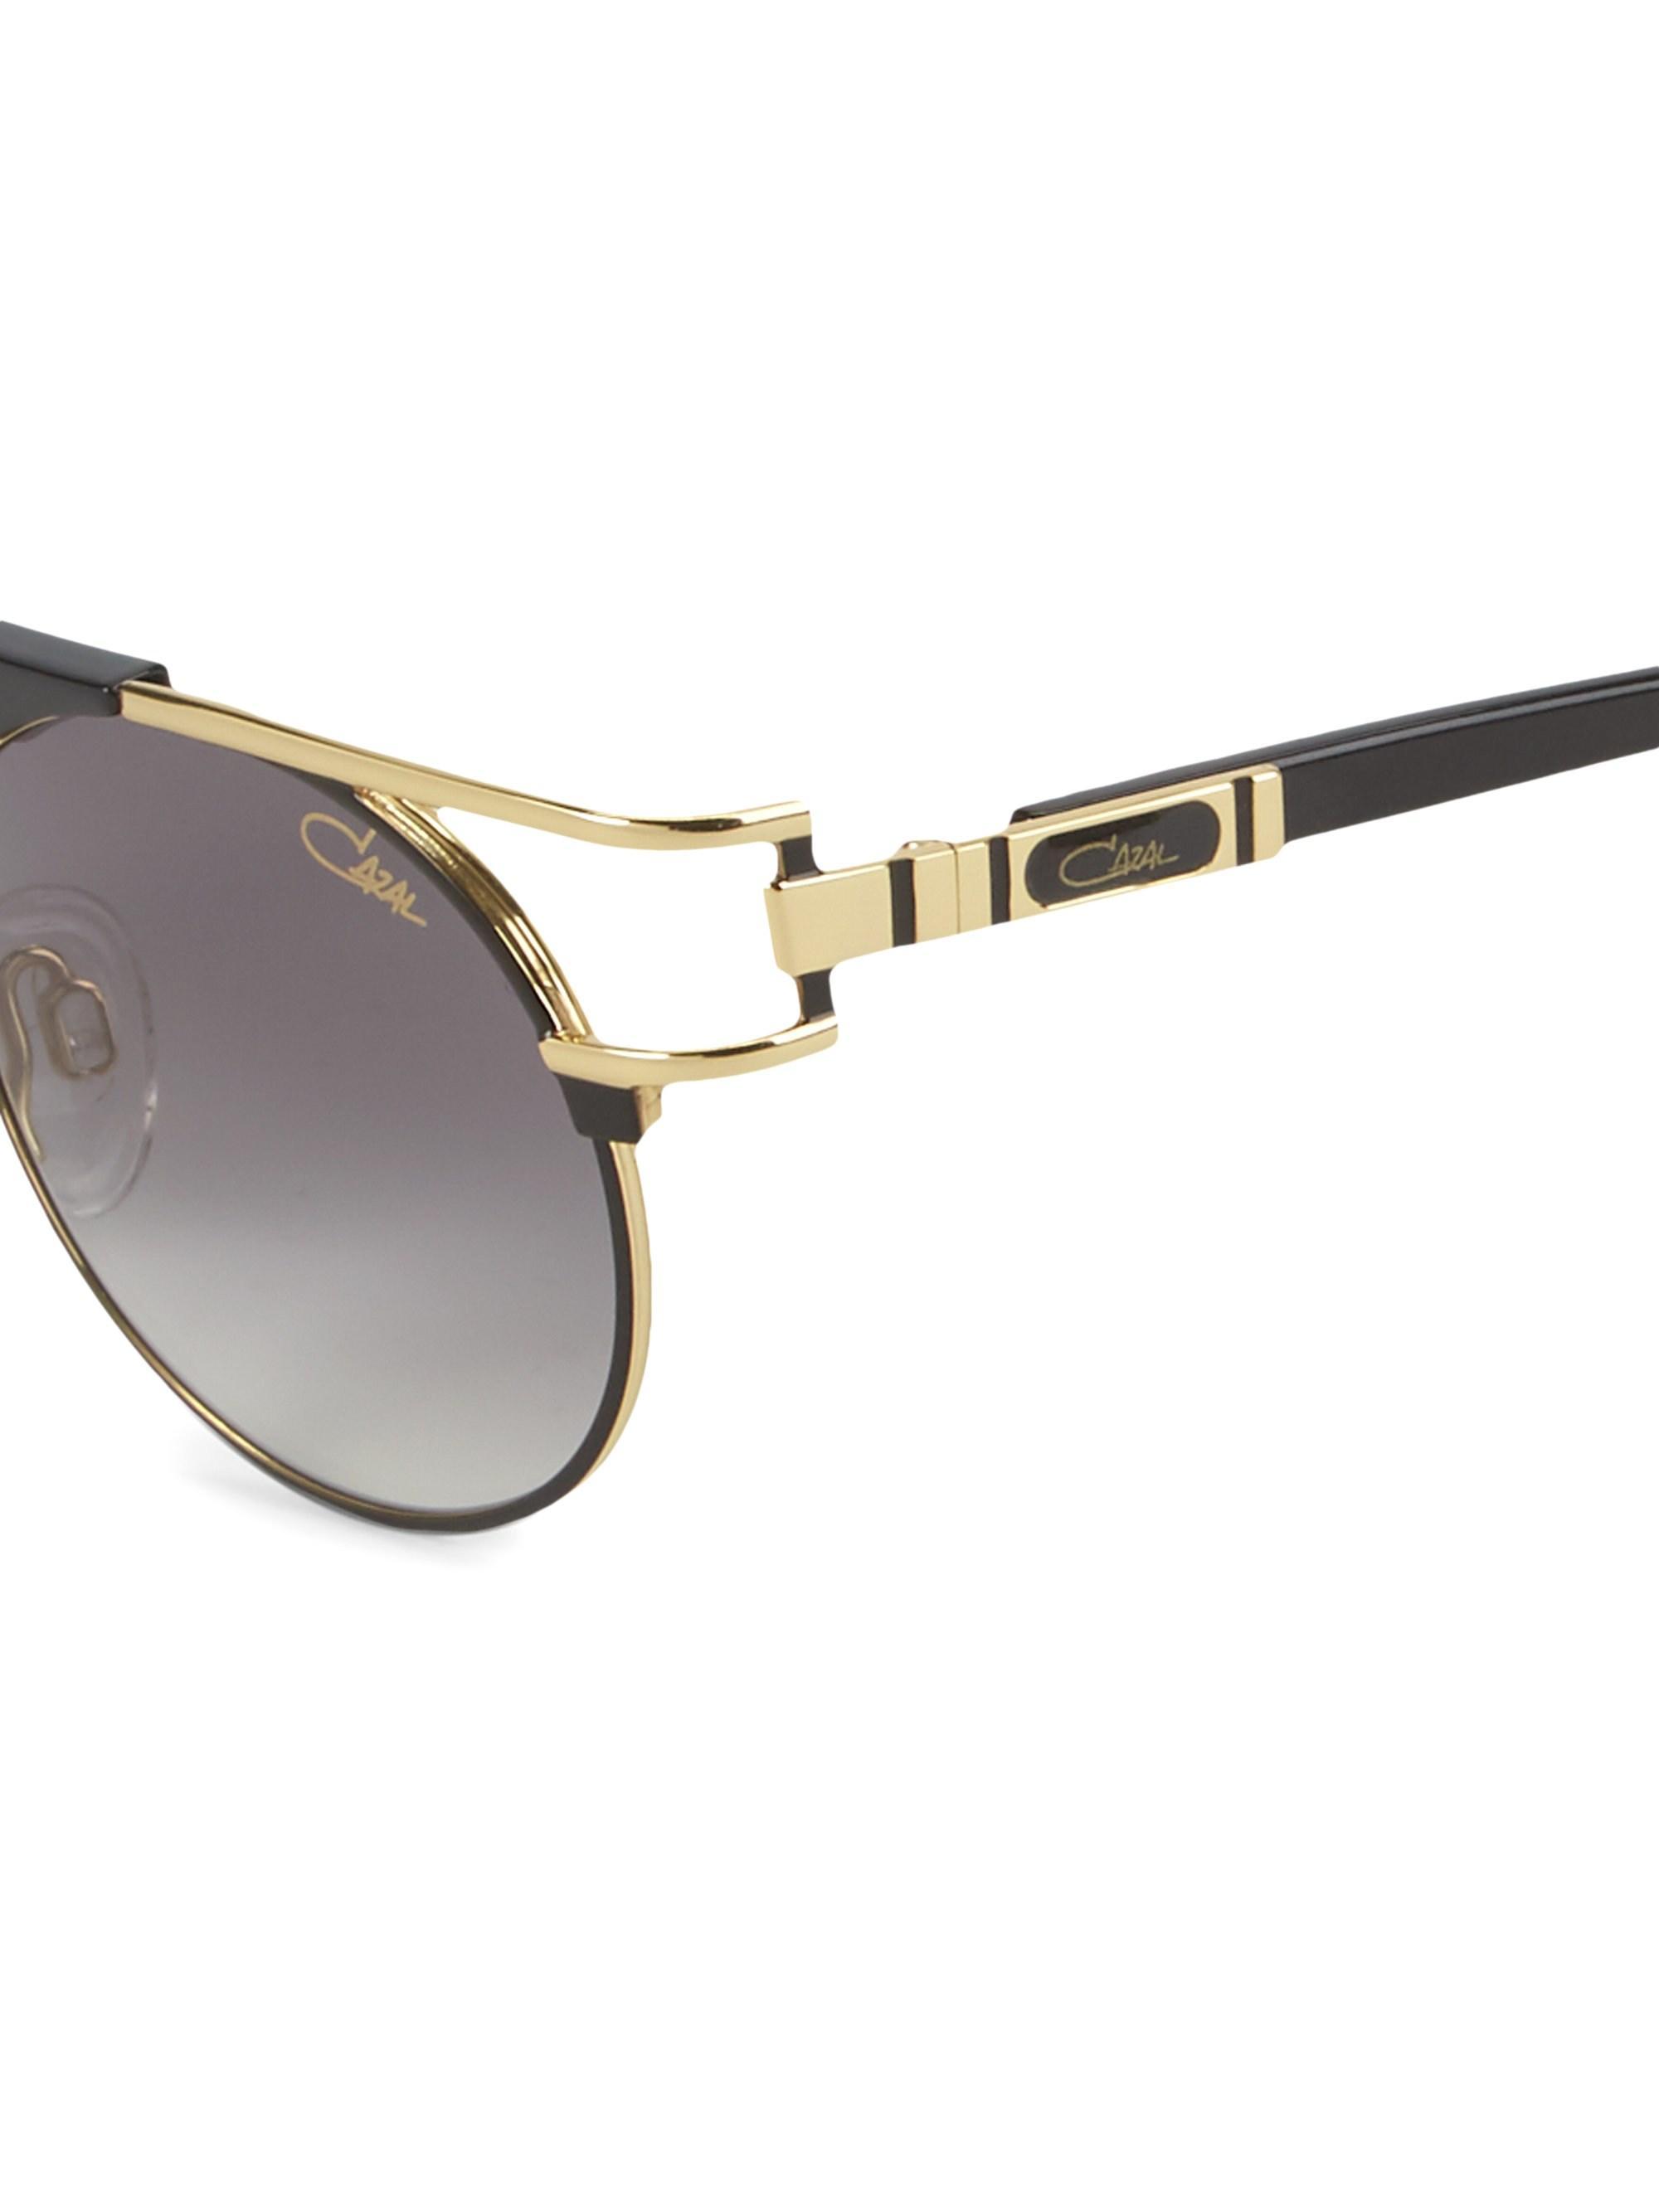 38c0901f660 Cazal Legend 50mm Round Aviator Sunglasses in Black for Men - Lyst